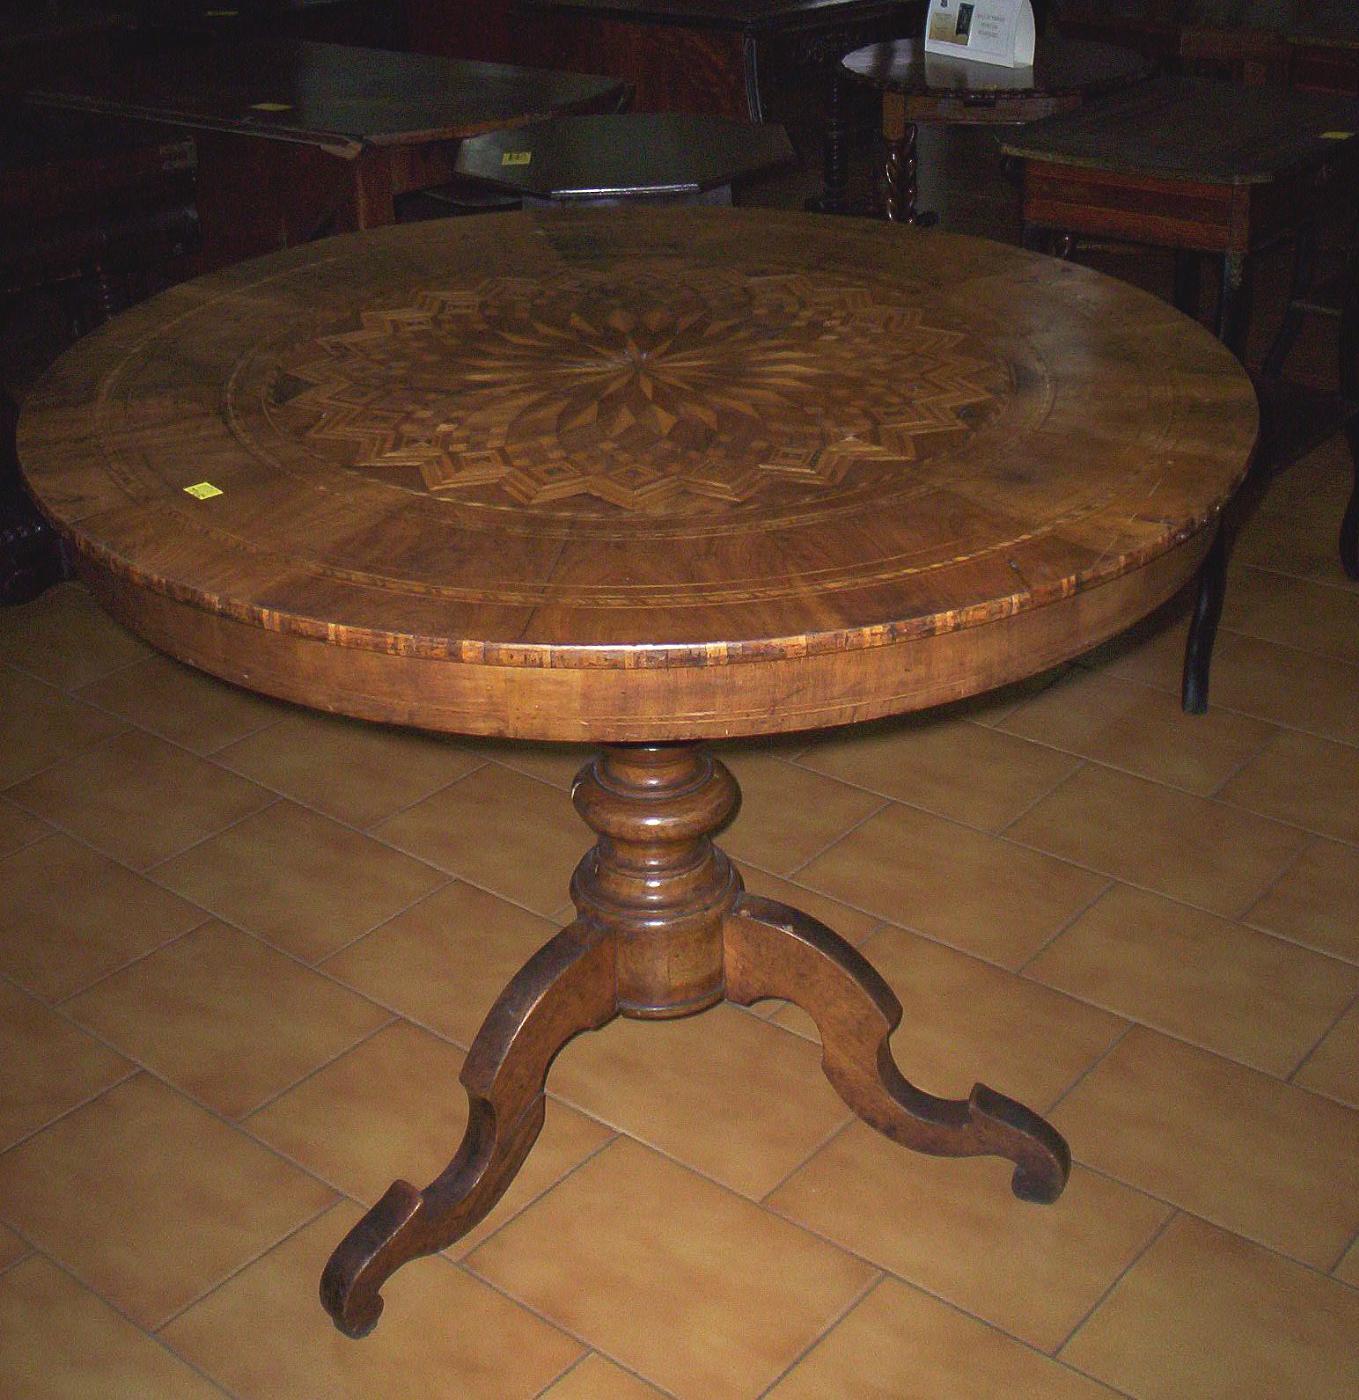 Tavoli e tavolini tavolino sorrentino - Tavoli e tavolini ...